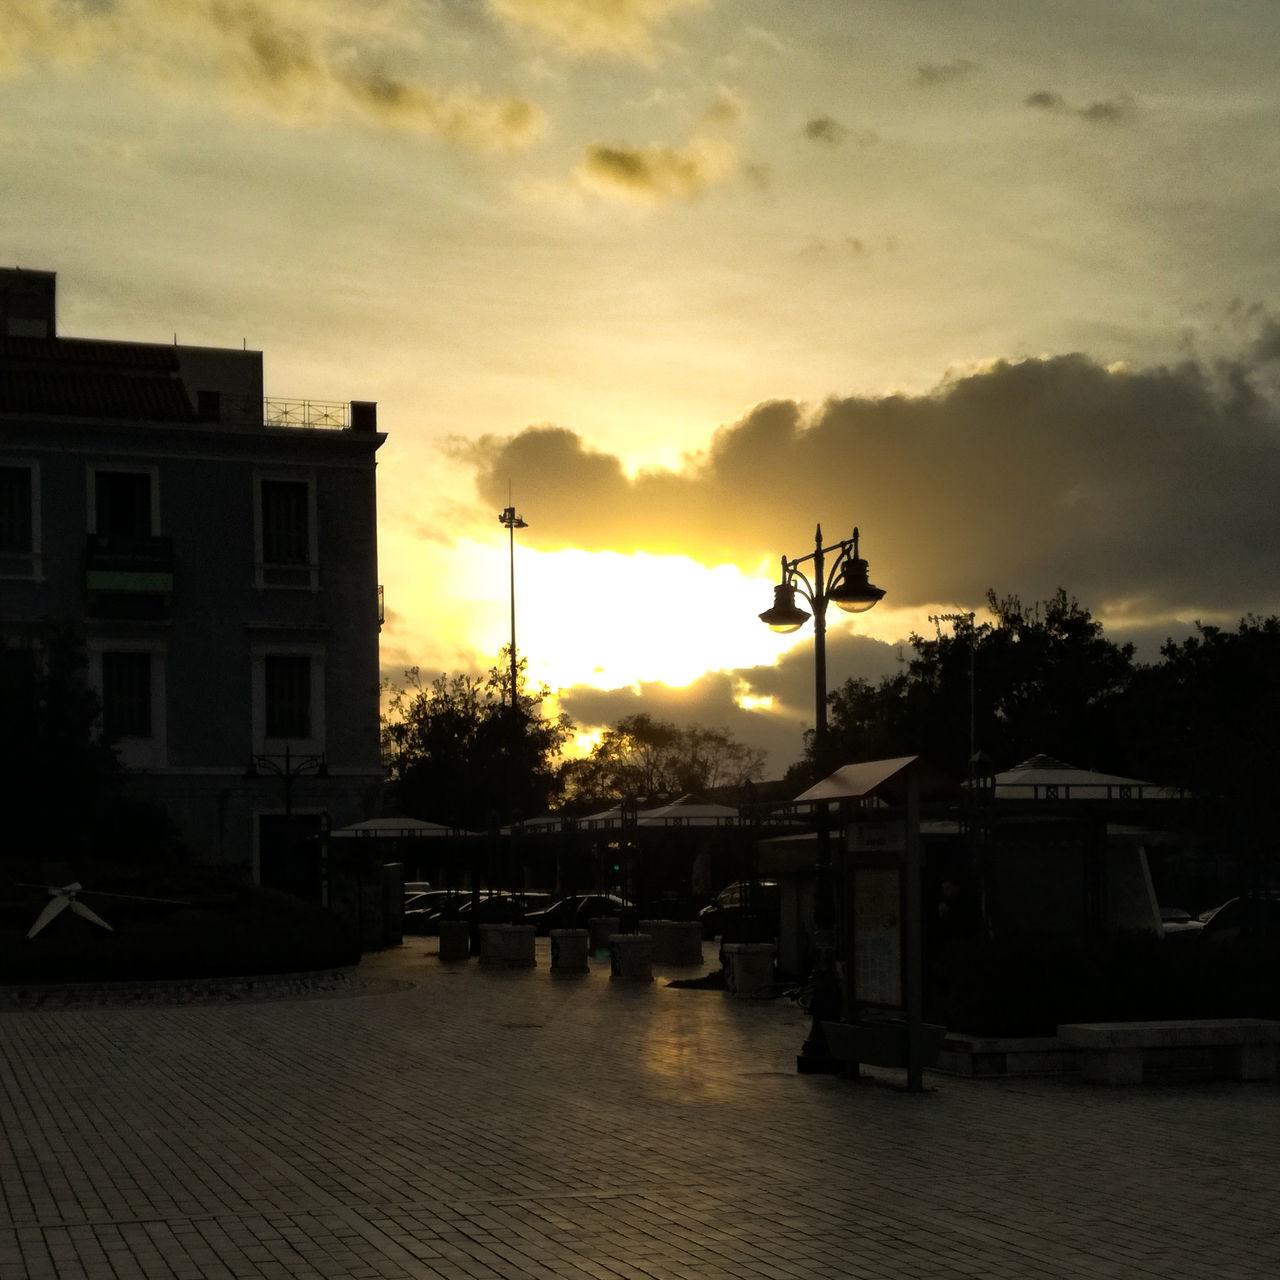 Beautiful sunset 🌇 First Eyeem Photo Outdoors EyeEmNewHere EyeEm Best Shots - Nature Cloud - Sky EyeEm City Sun Sunset Sunshine ☀ EyeEmNewHere